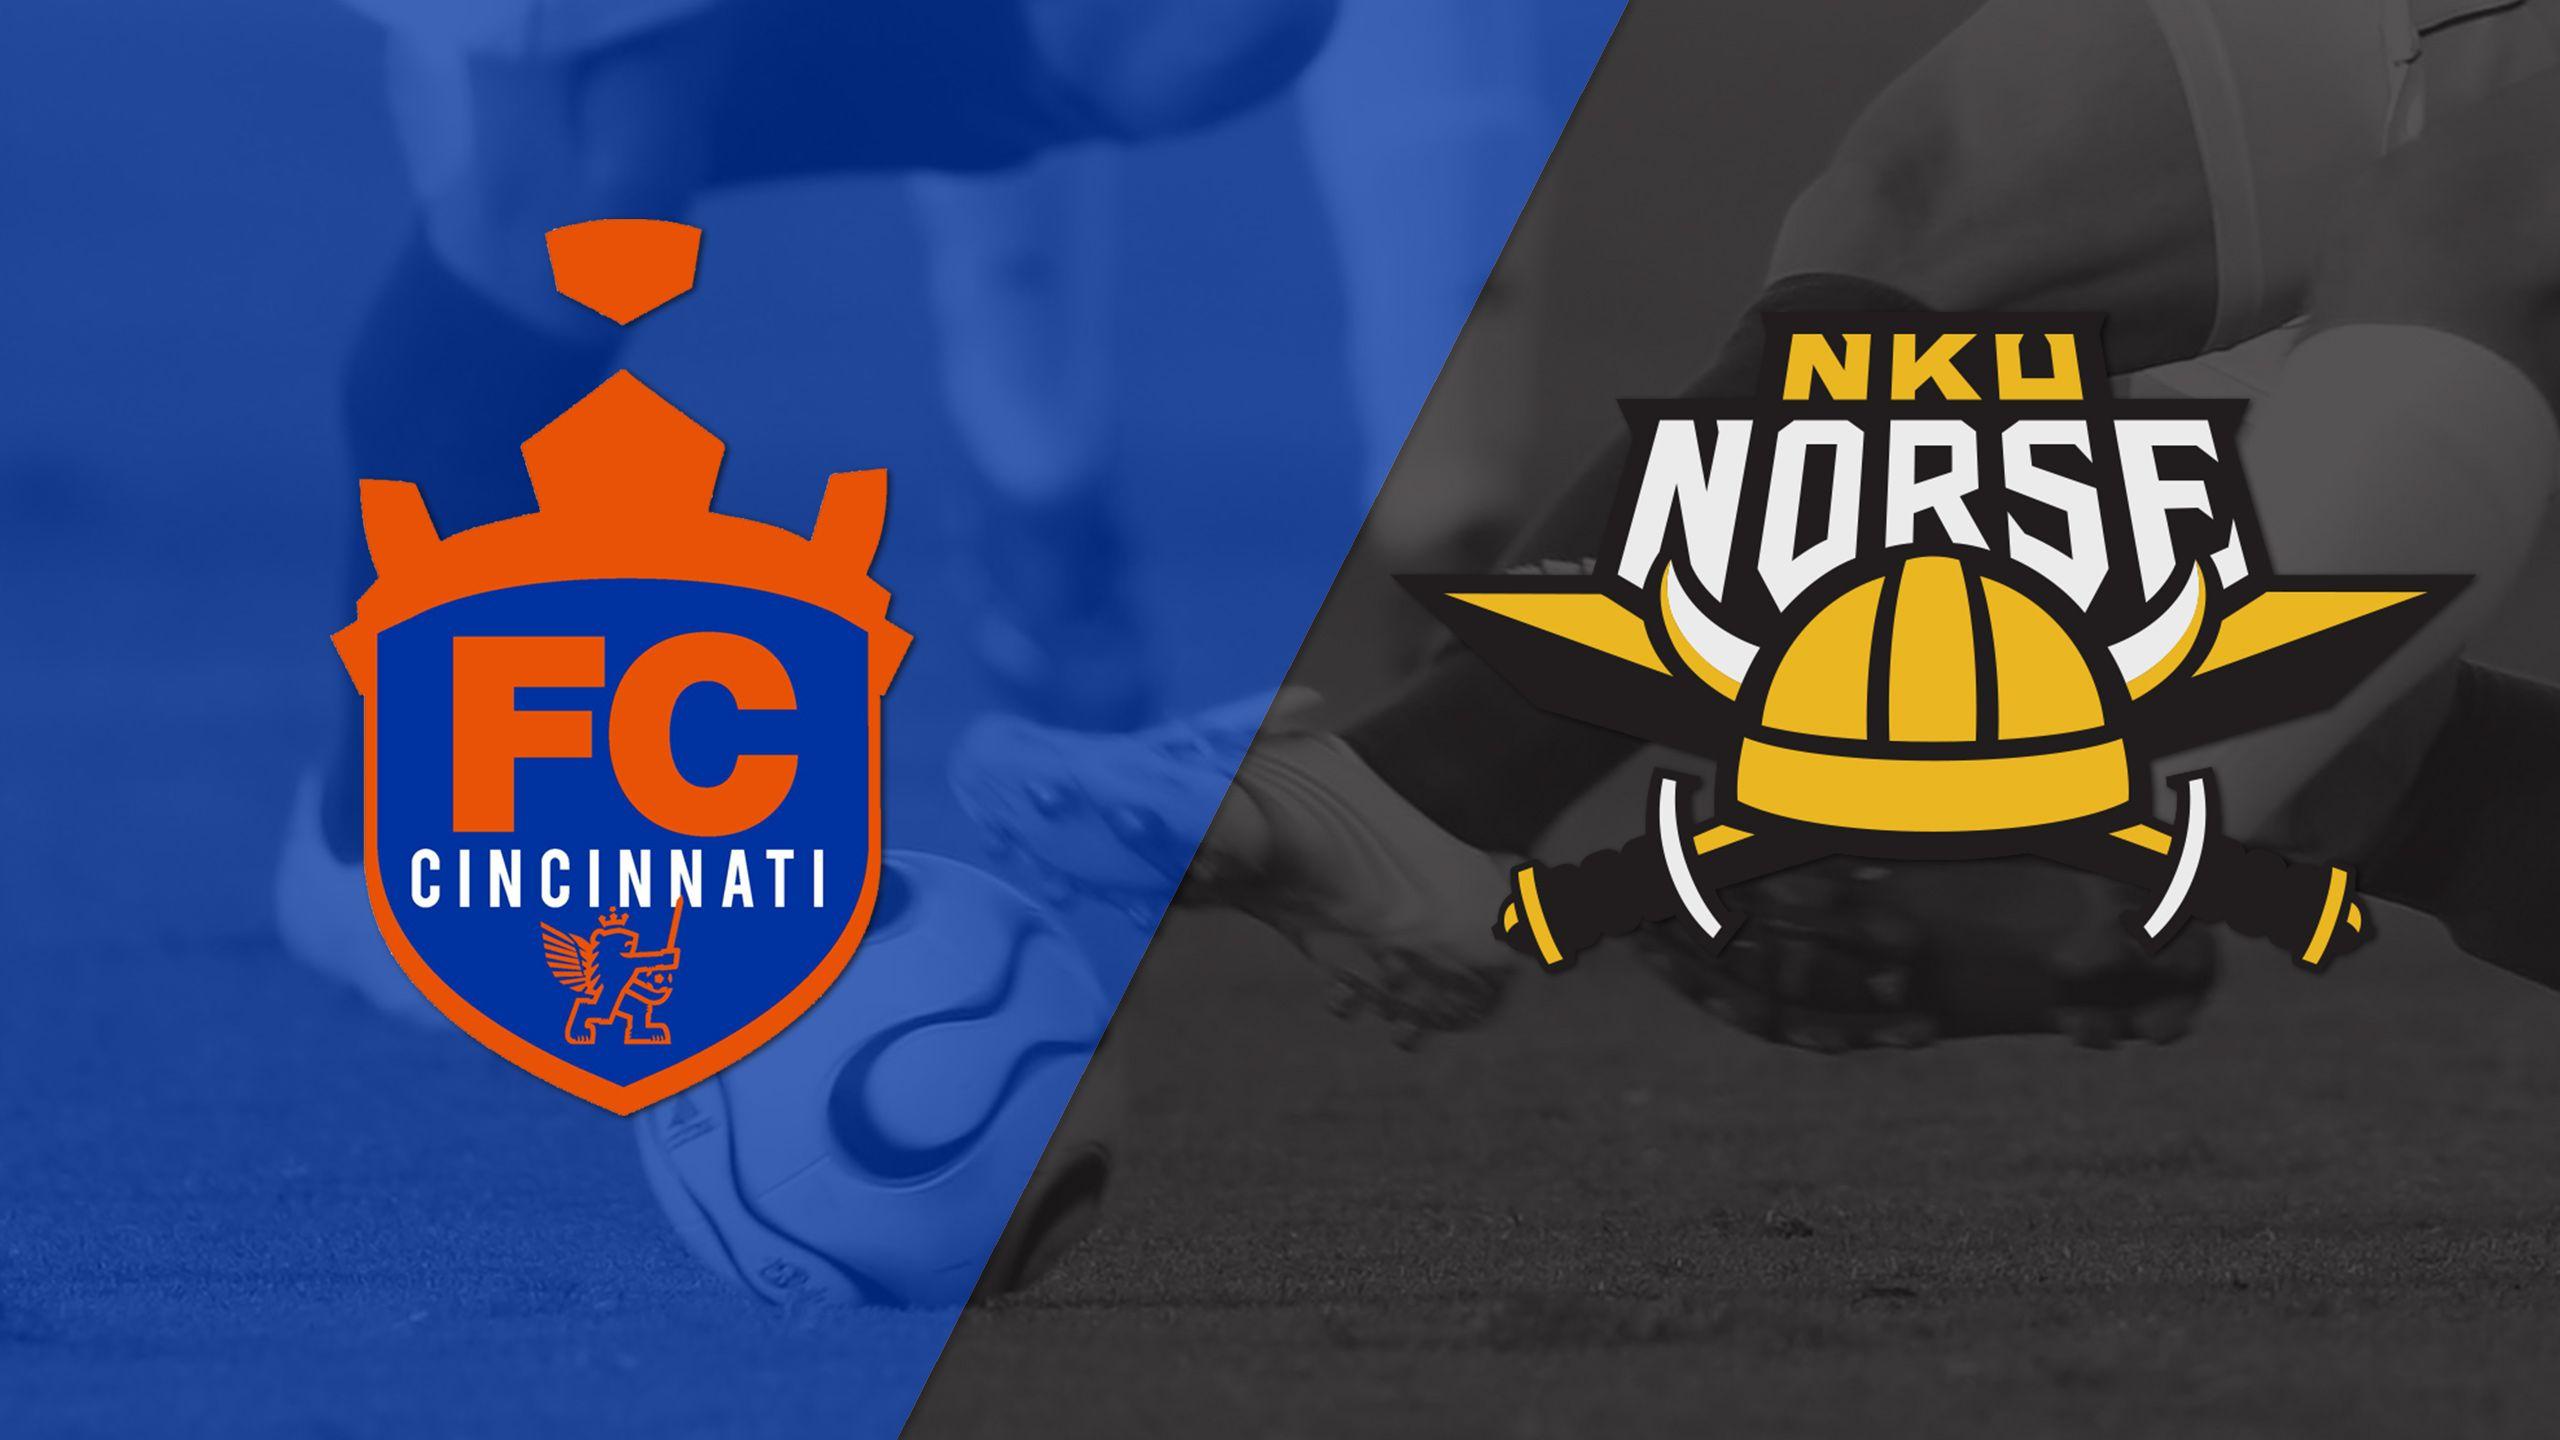 FC Cincinnati vs. Northern Kentucky (M Soccer)